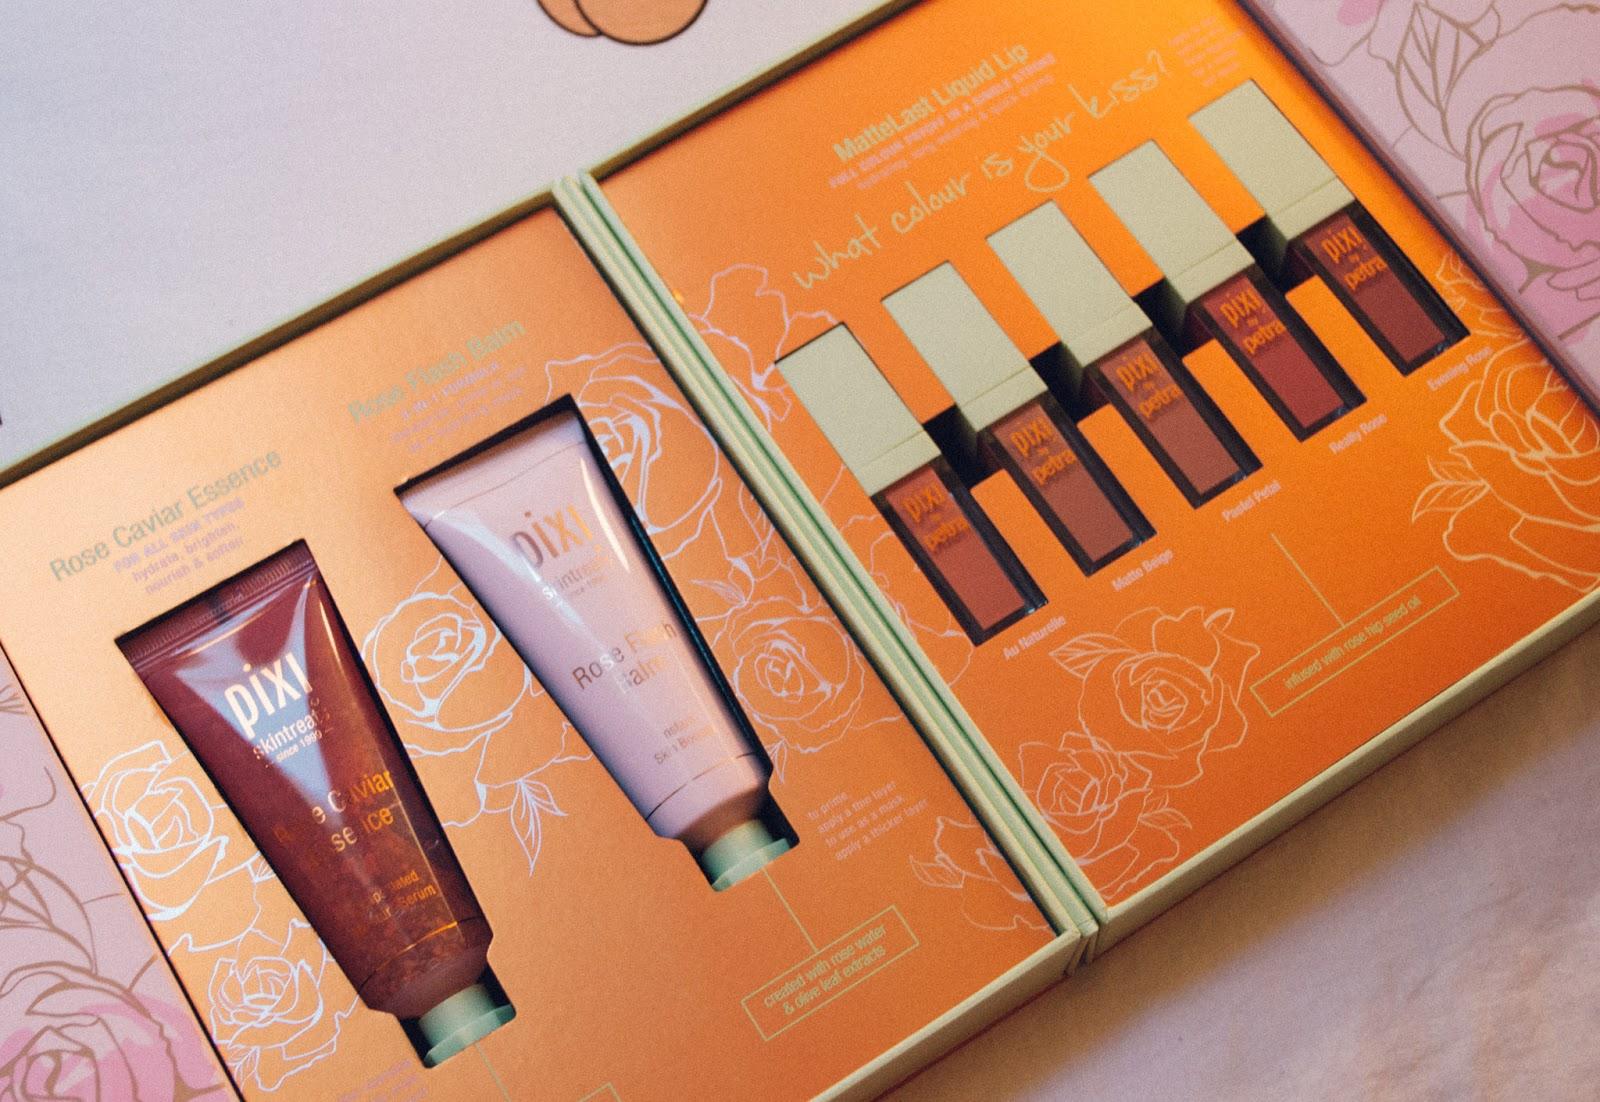 Pixi Beauty Brand